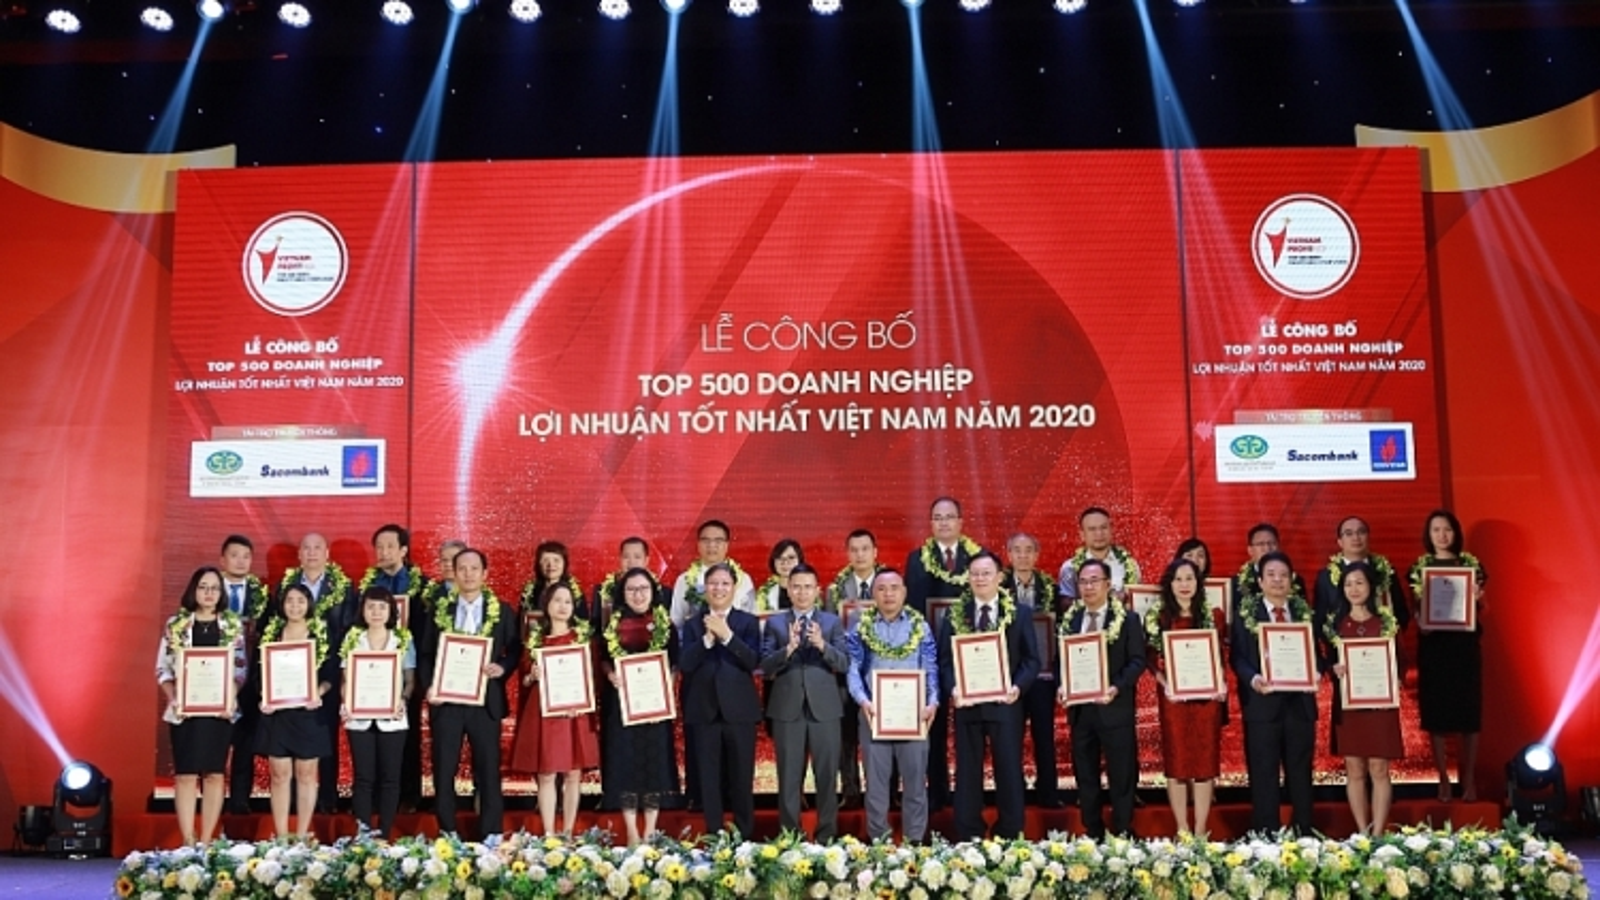 Top 500 most profitable enterprises in Vietnam this year unveiled